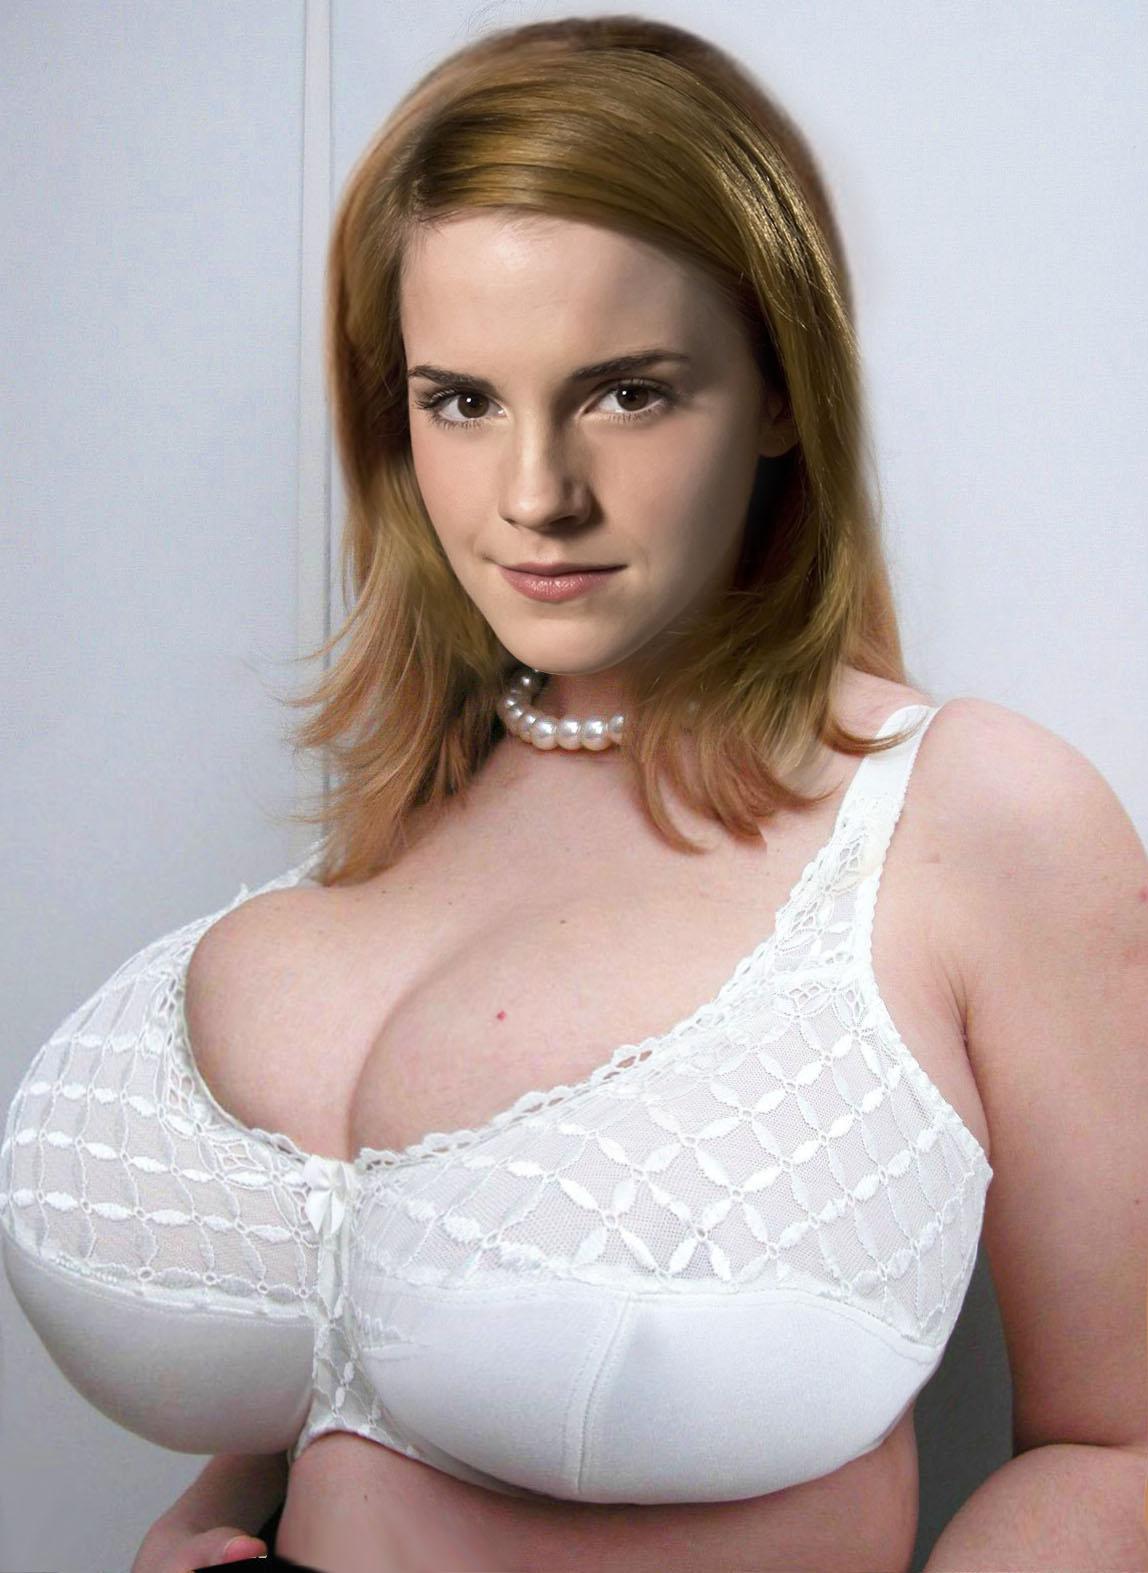 Massive Naked Tits Tits Galleries Naked Emma Watson